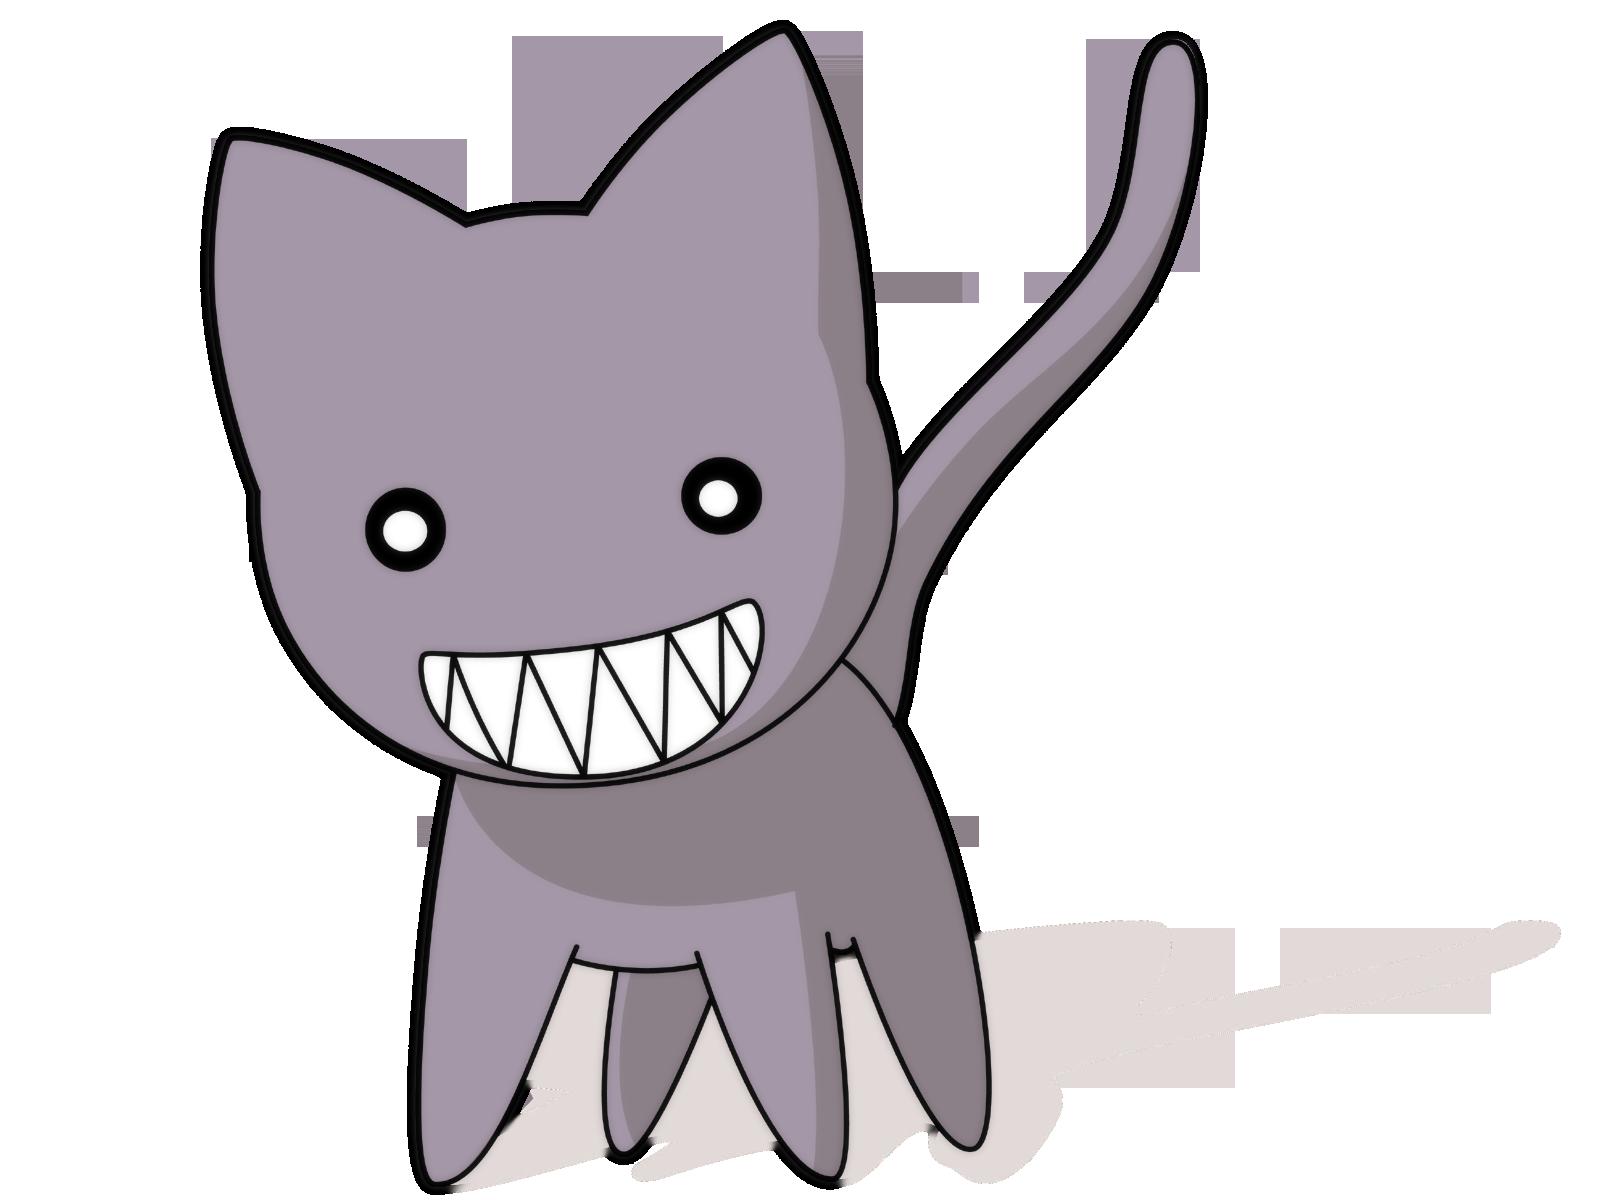 Картинки котов аниме без фона, удачного